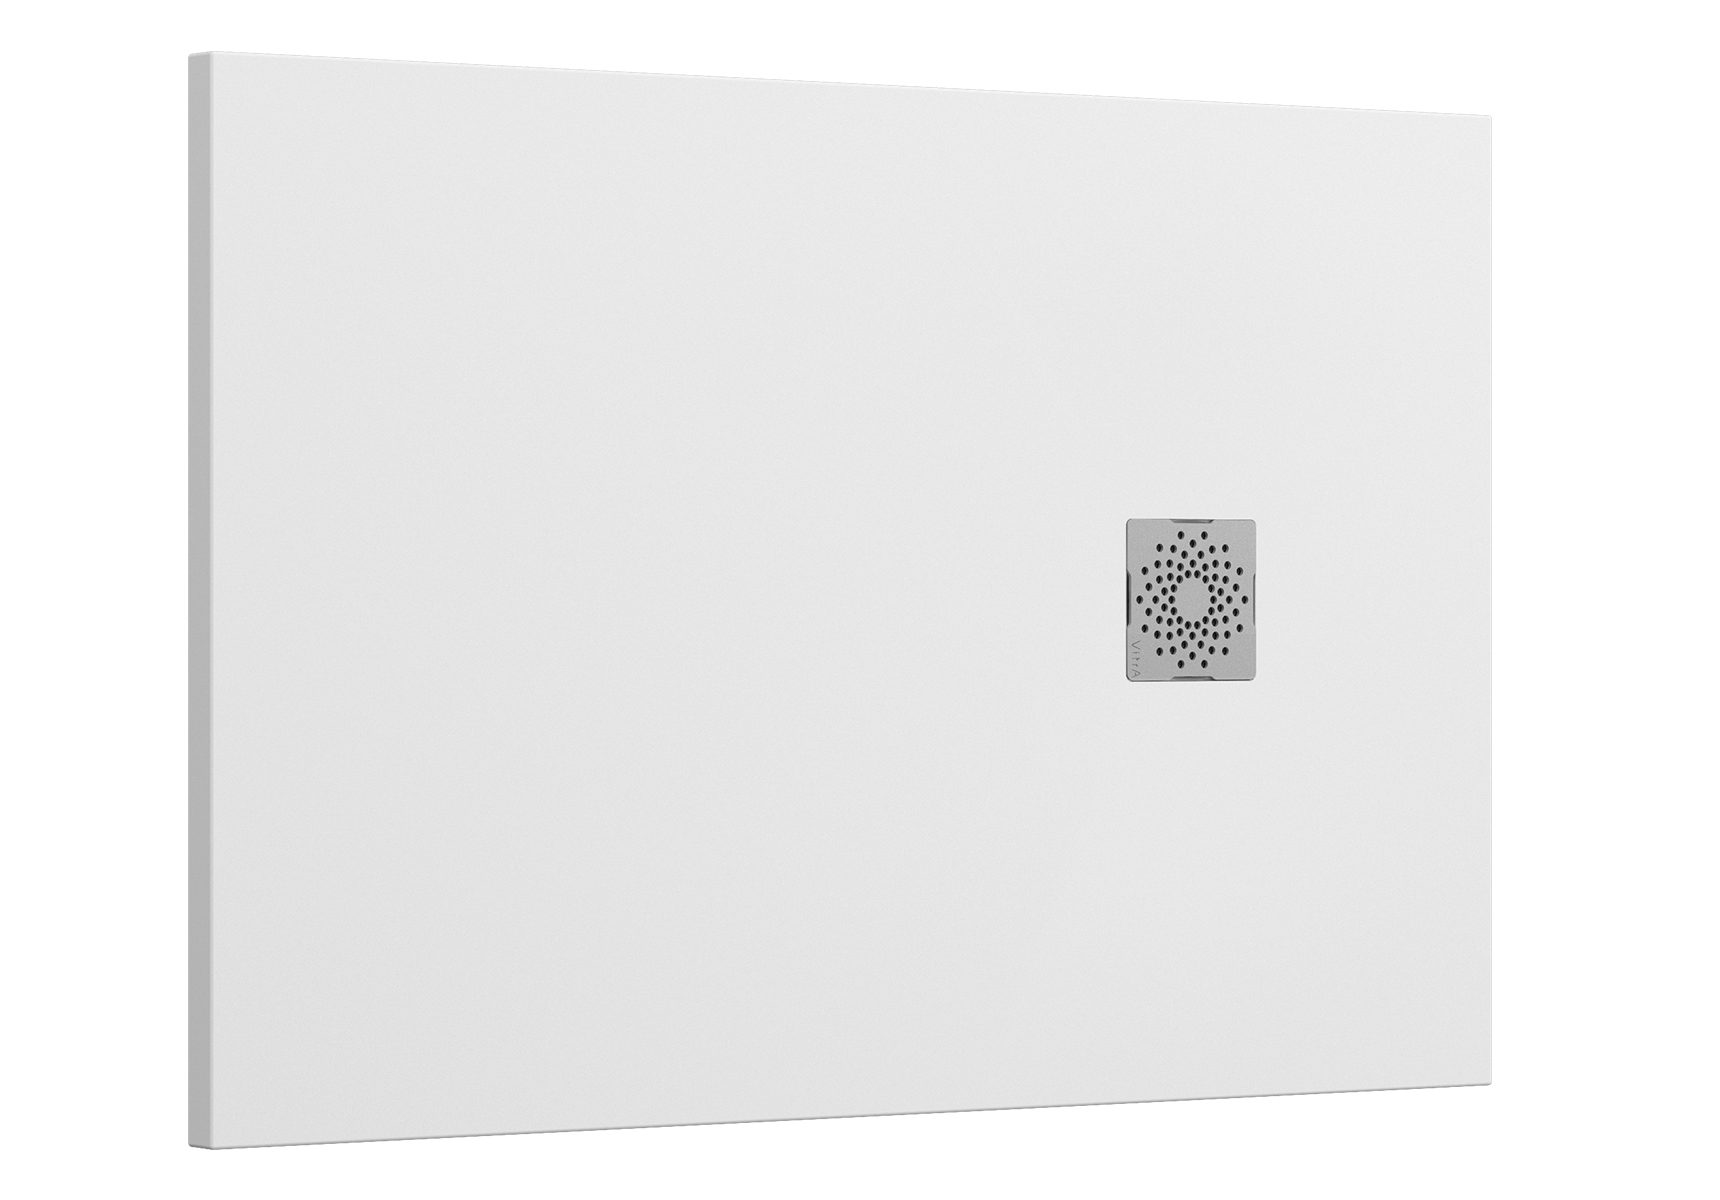 V-Stone Duschwanne, 120 x 80 cm, Weiß